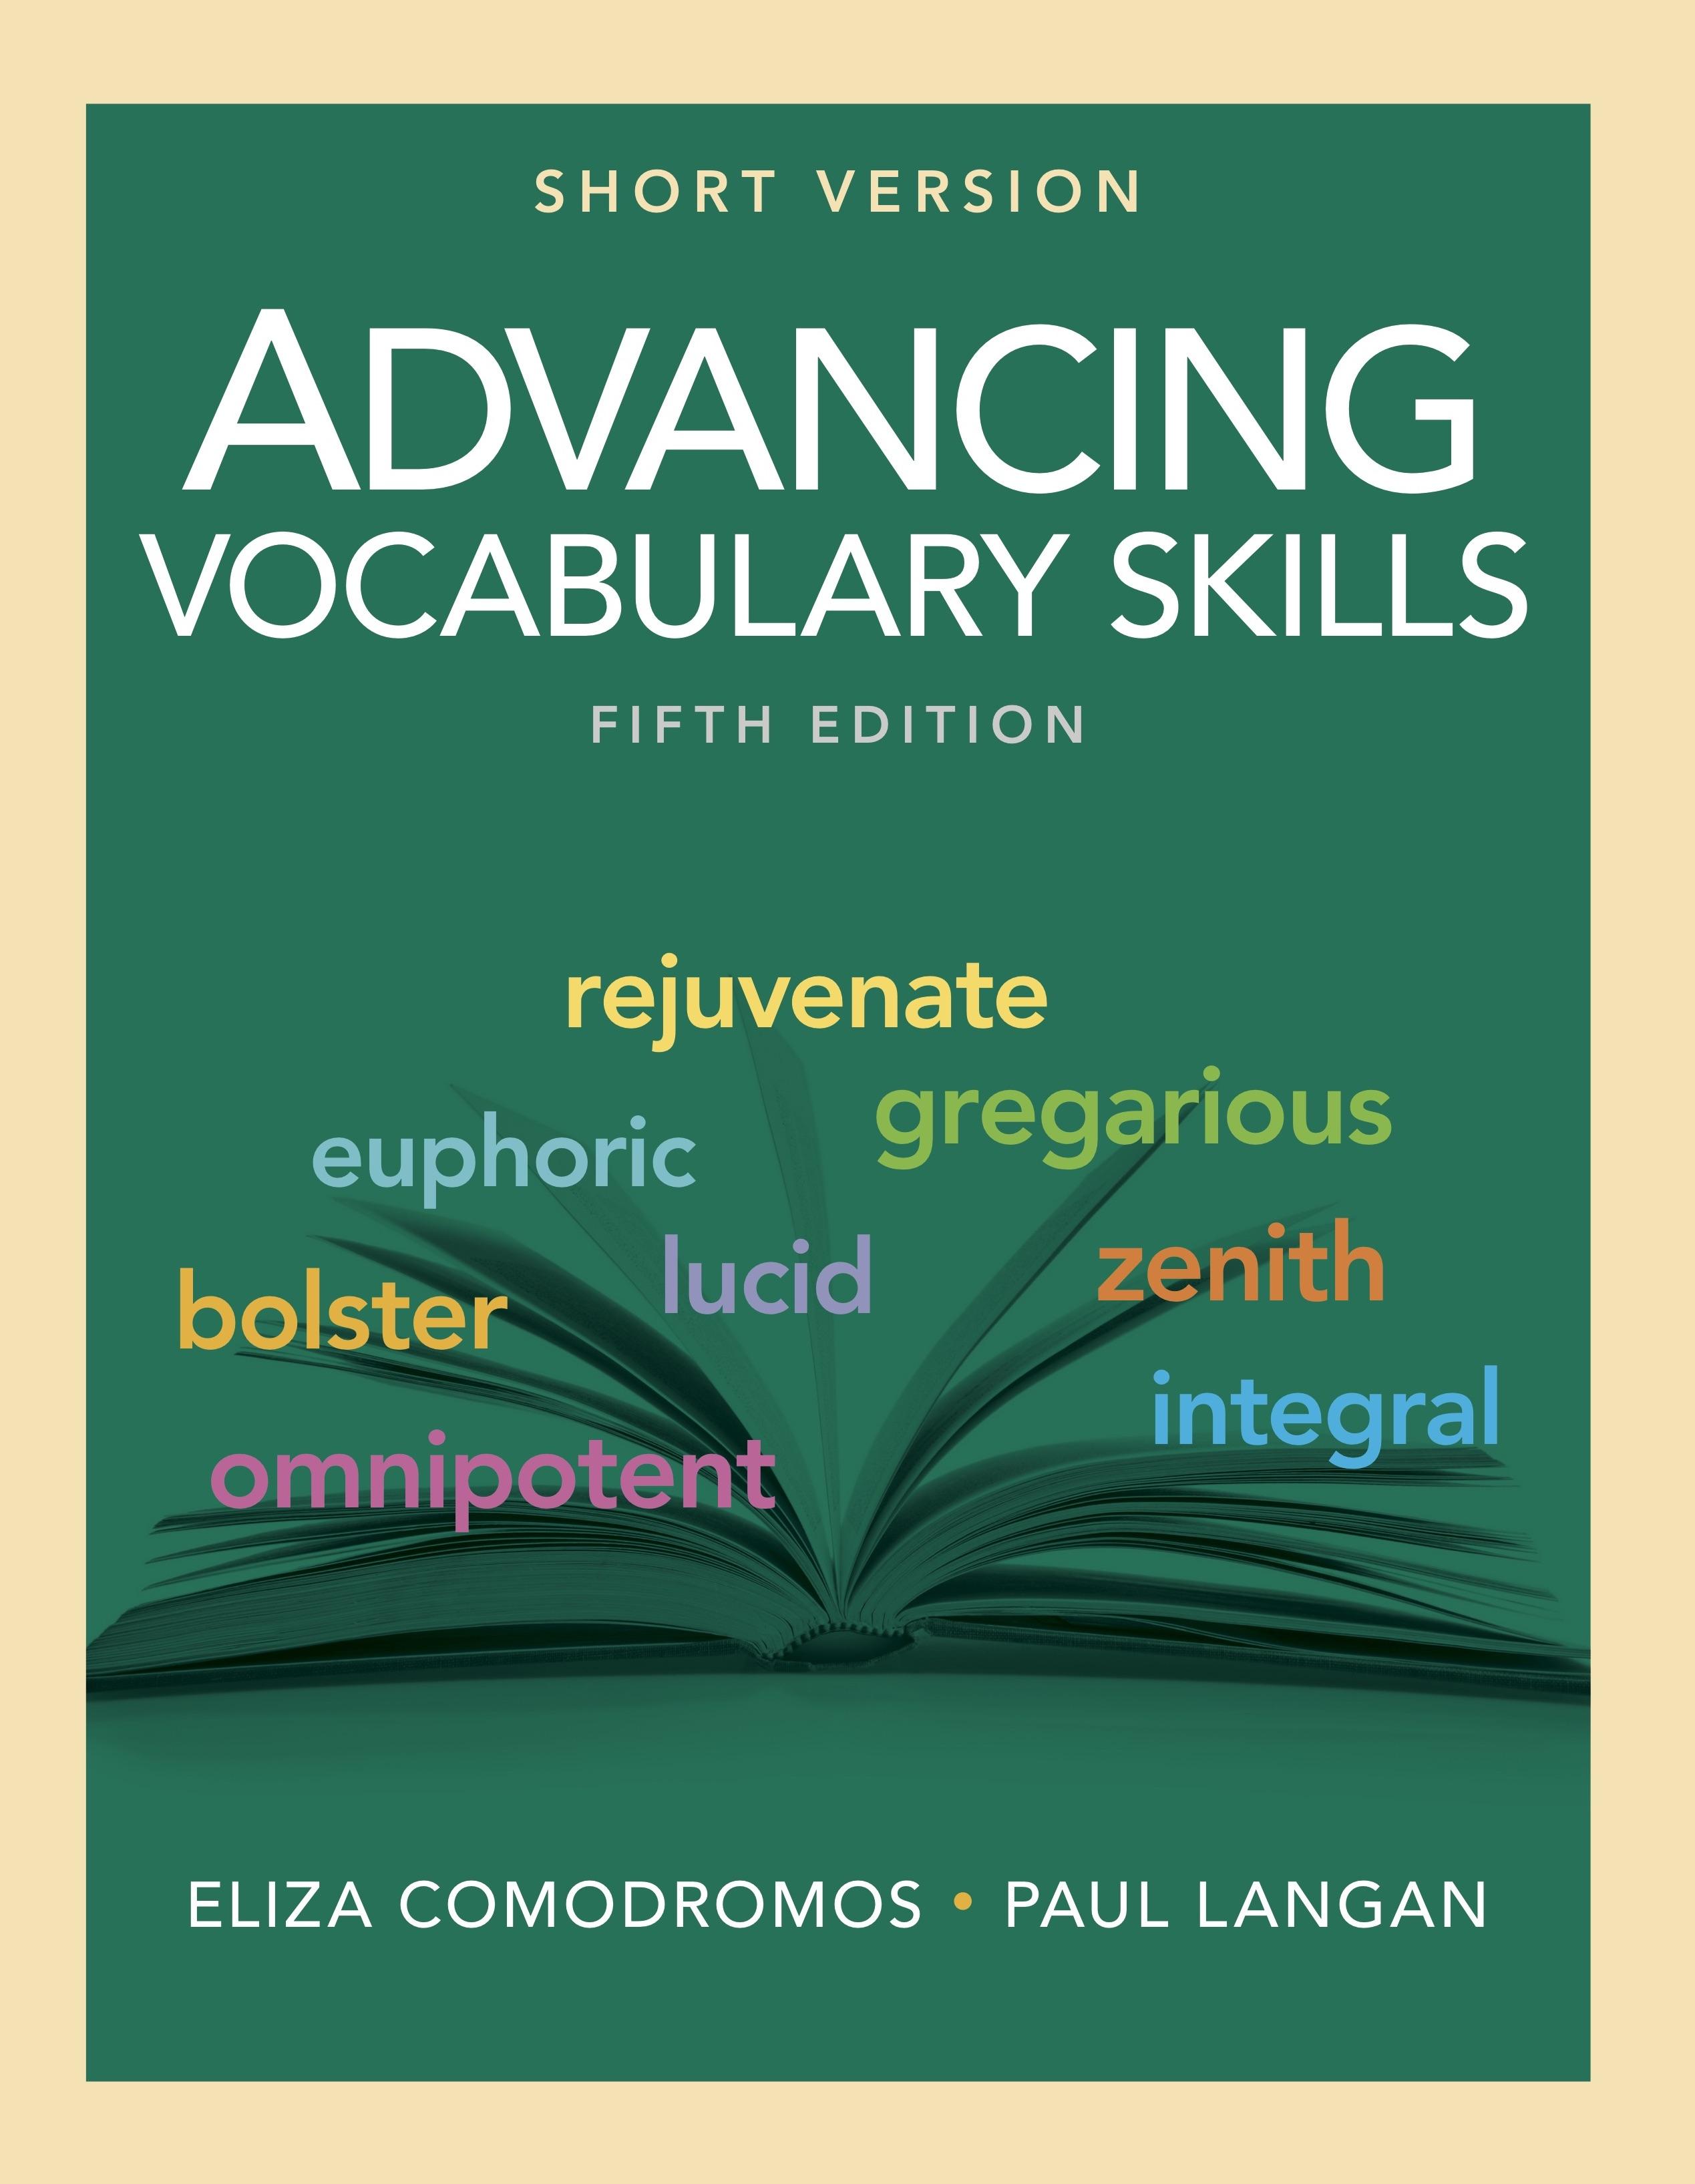 Advancing Vocabulary Skills Short Version 5 E Townsend Press